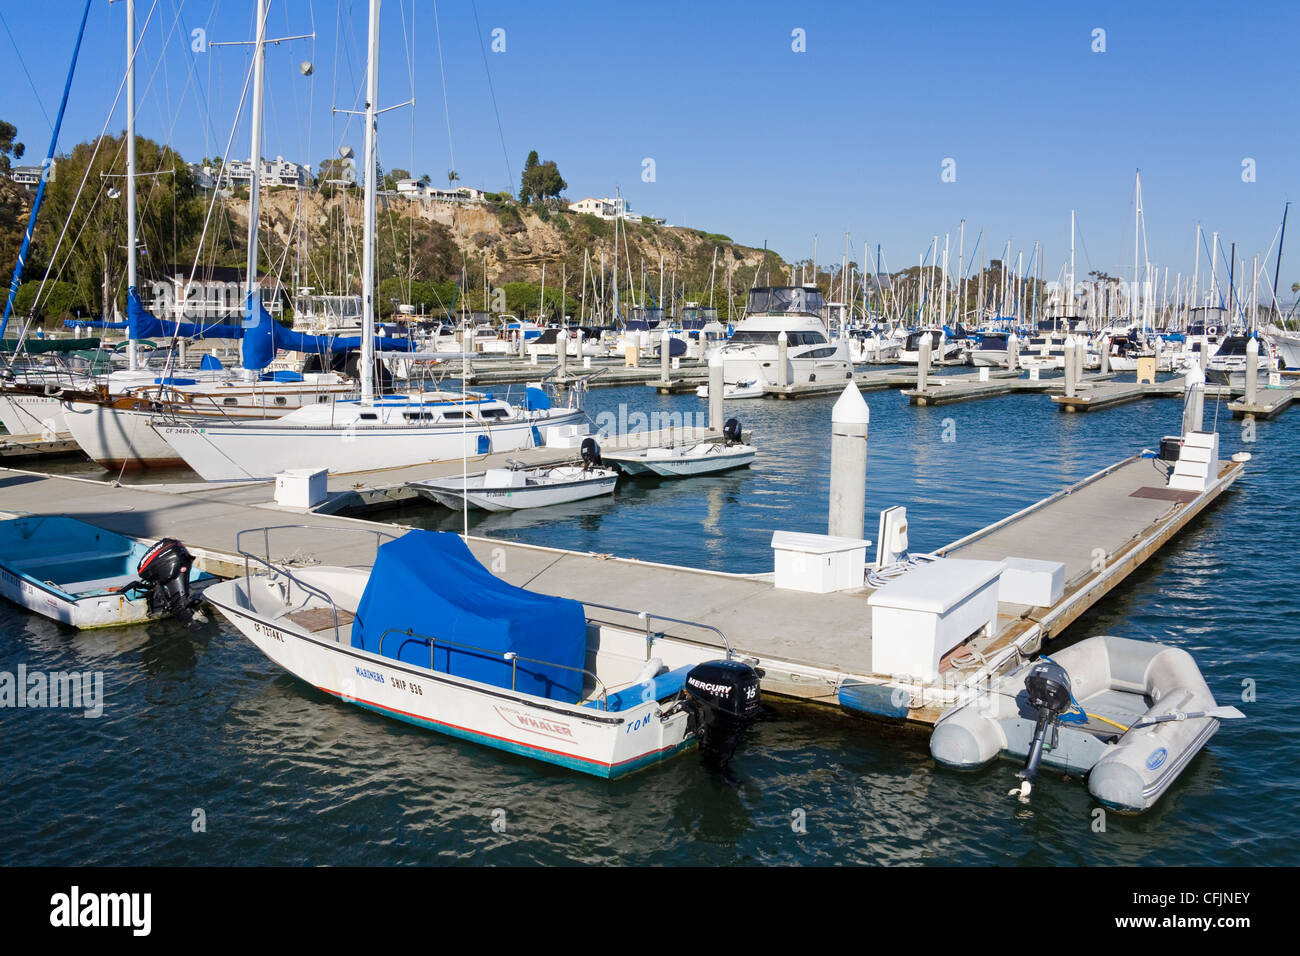 Marina in Dana Point Harbor, Orange County, California, United States of America, North America - Stock Image